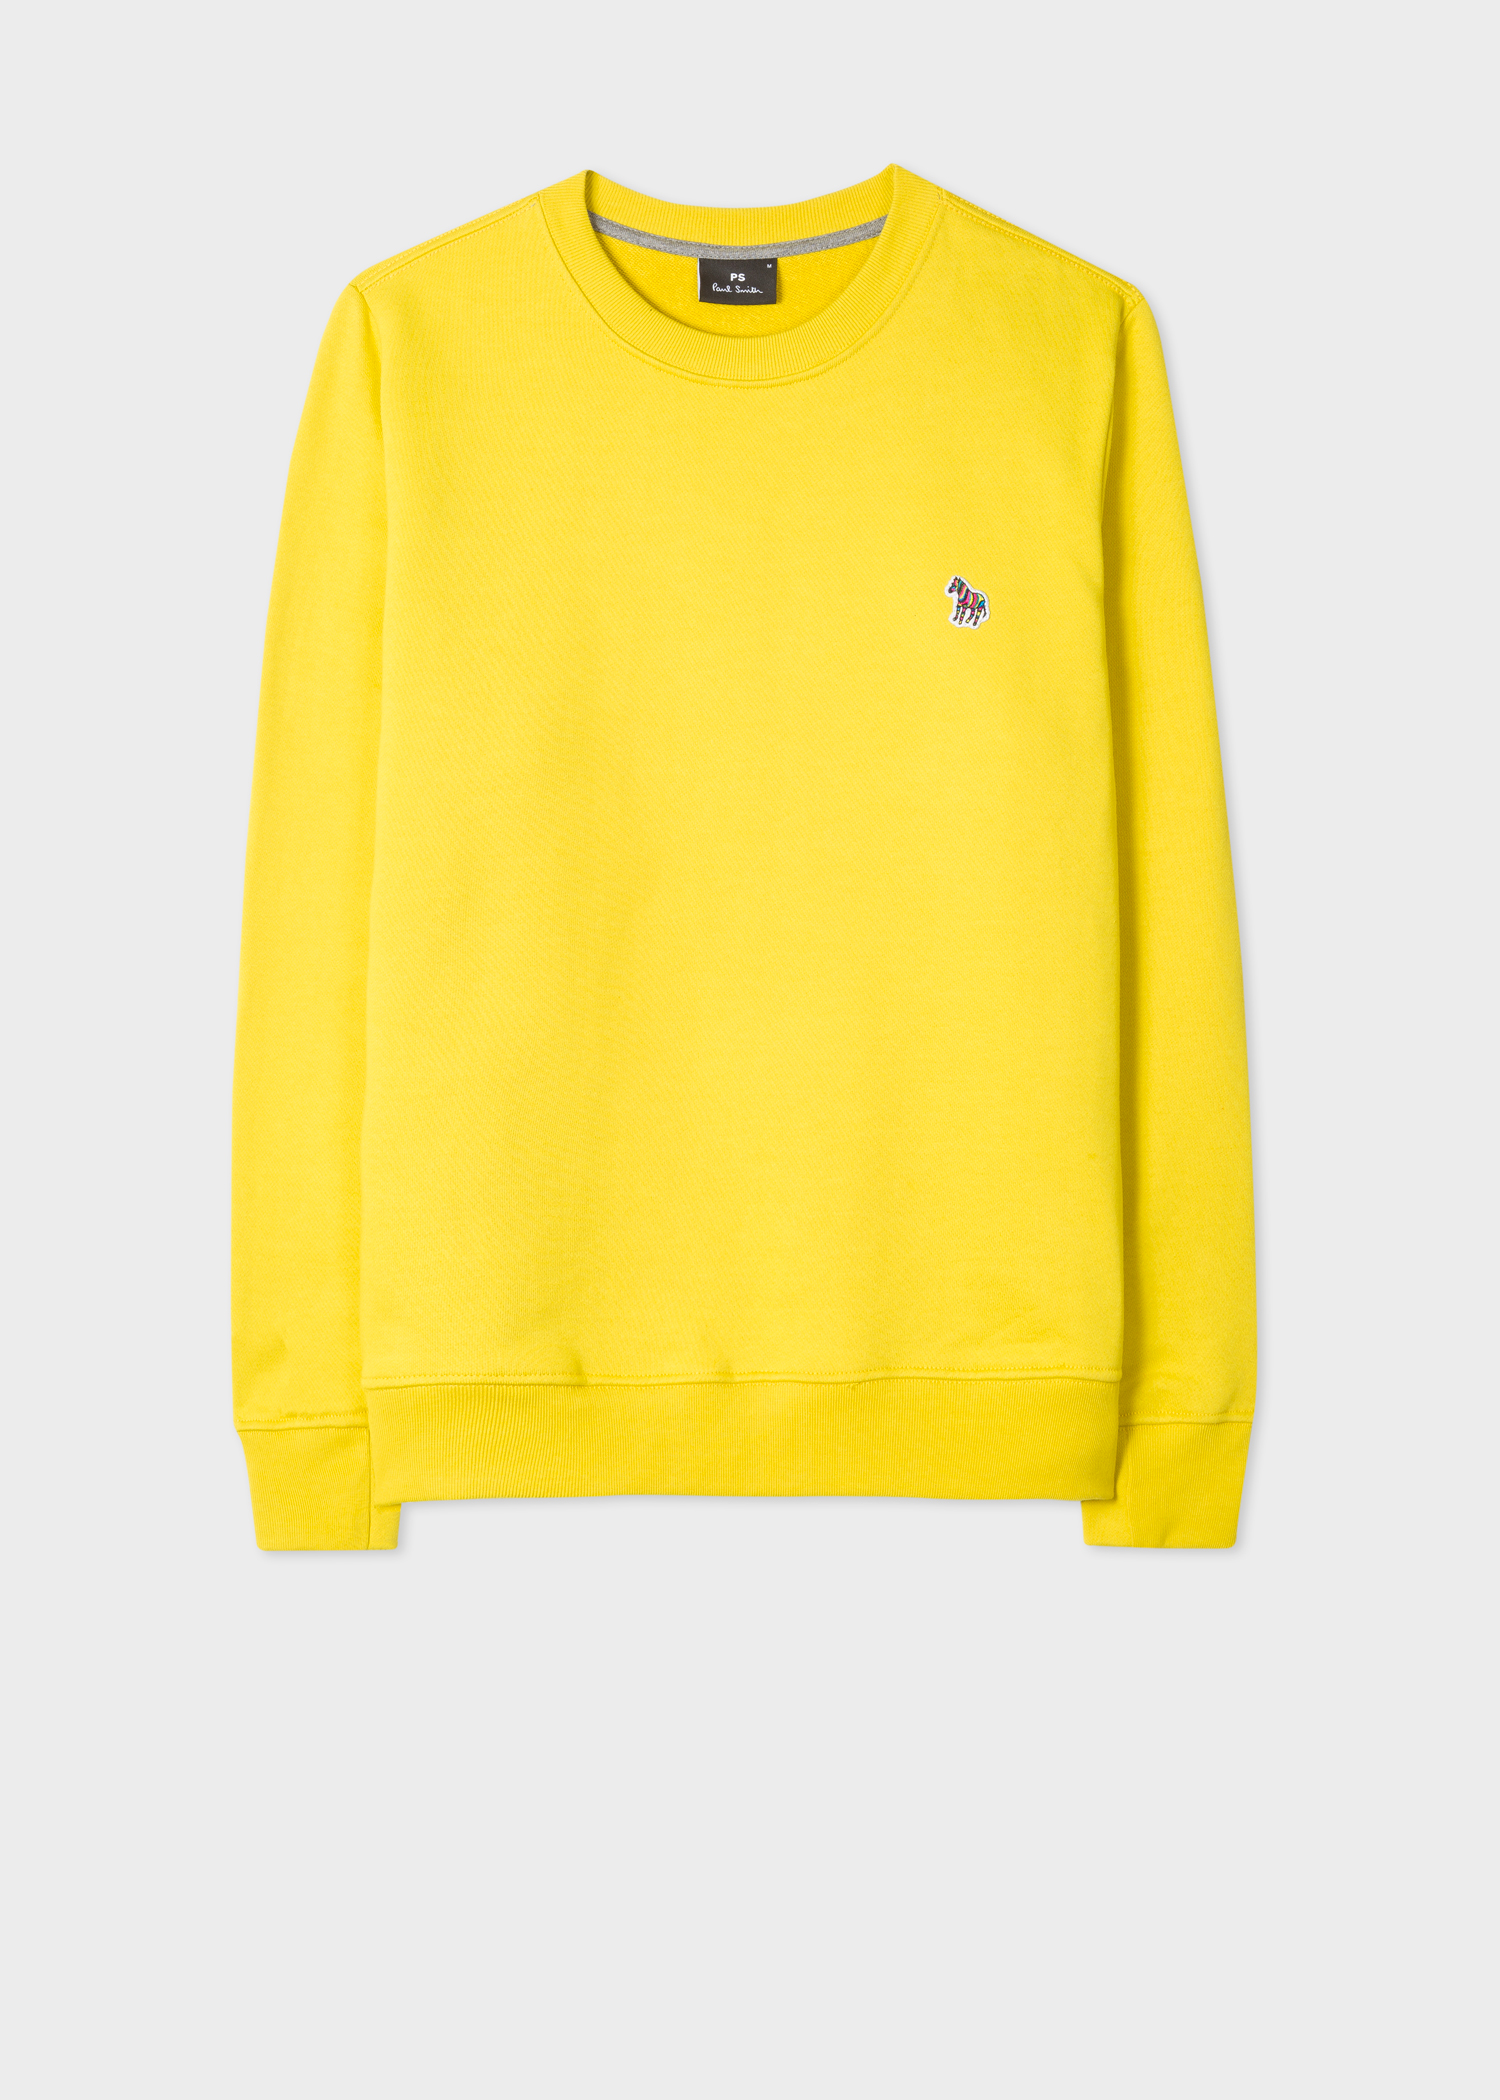 721b1db63 Front view - Men's Yellow Organic-Cotton Zebra Logo Sweatshirt Paul Smith